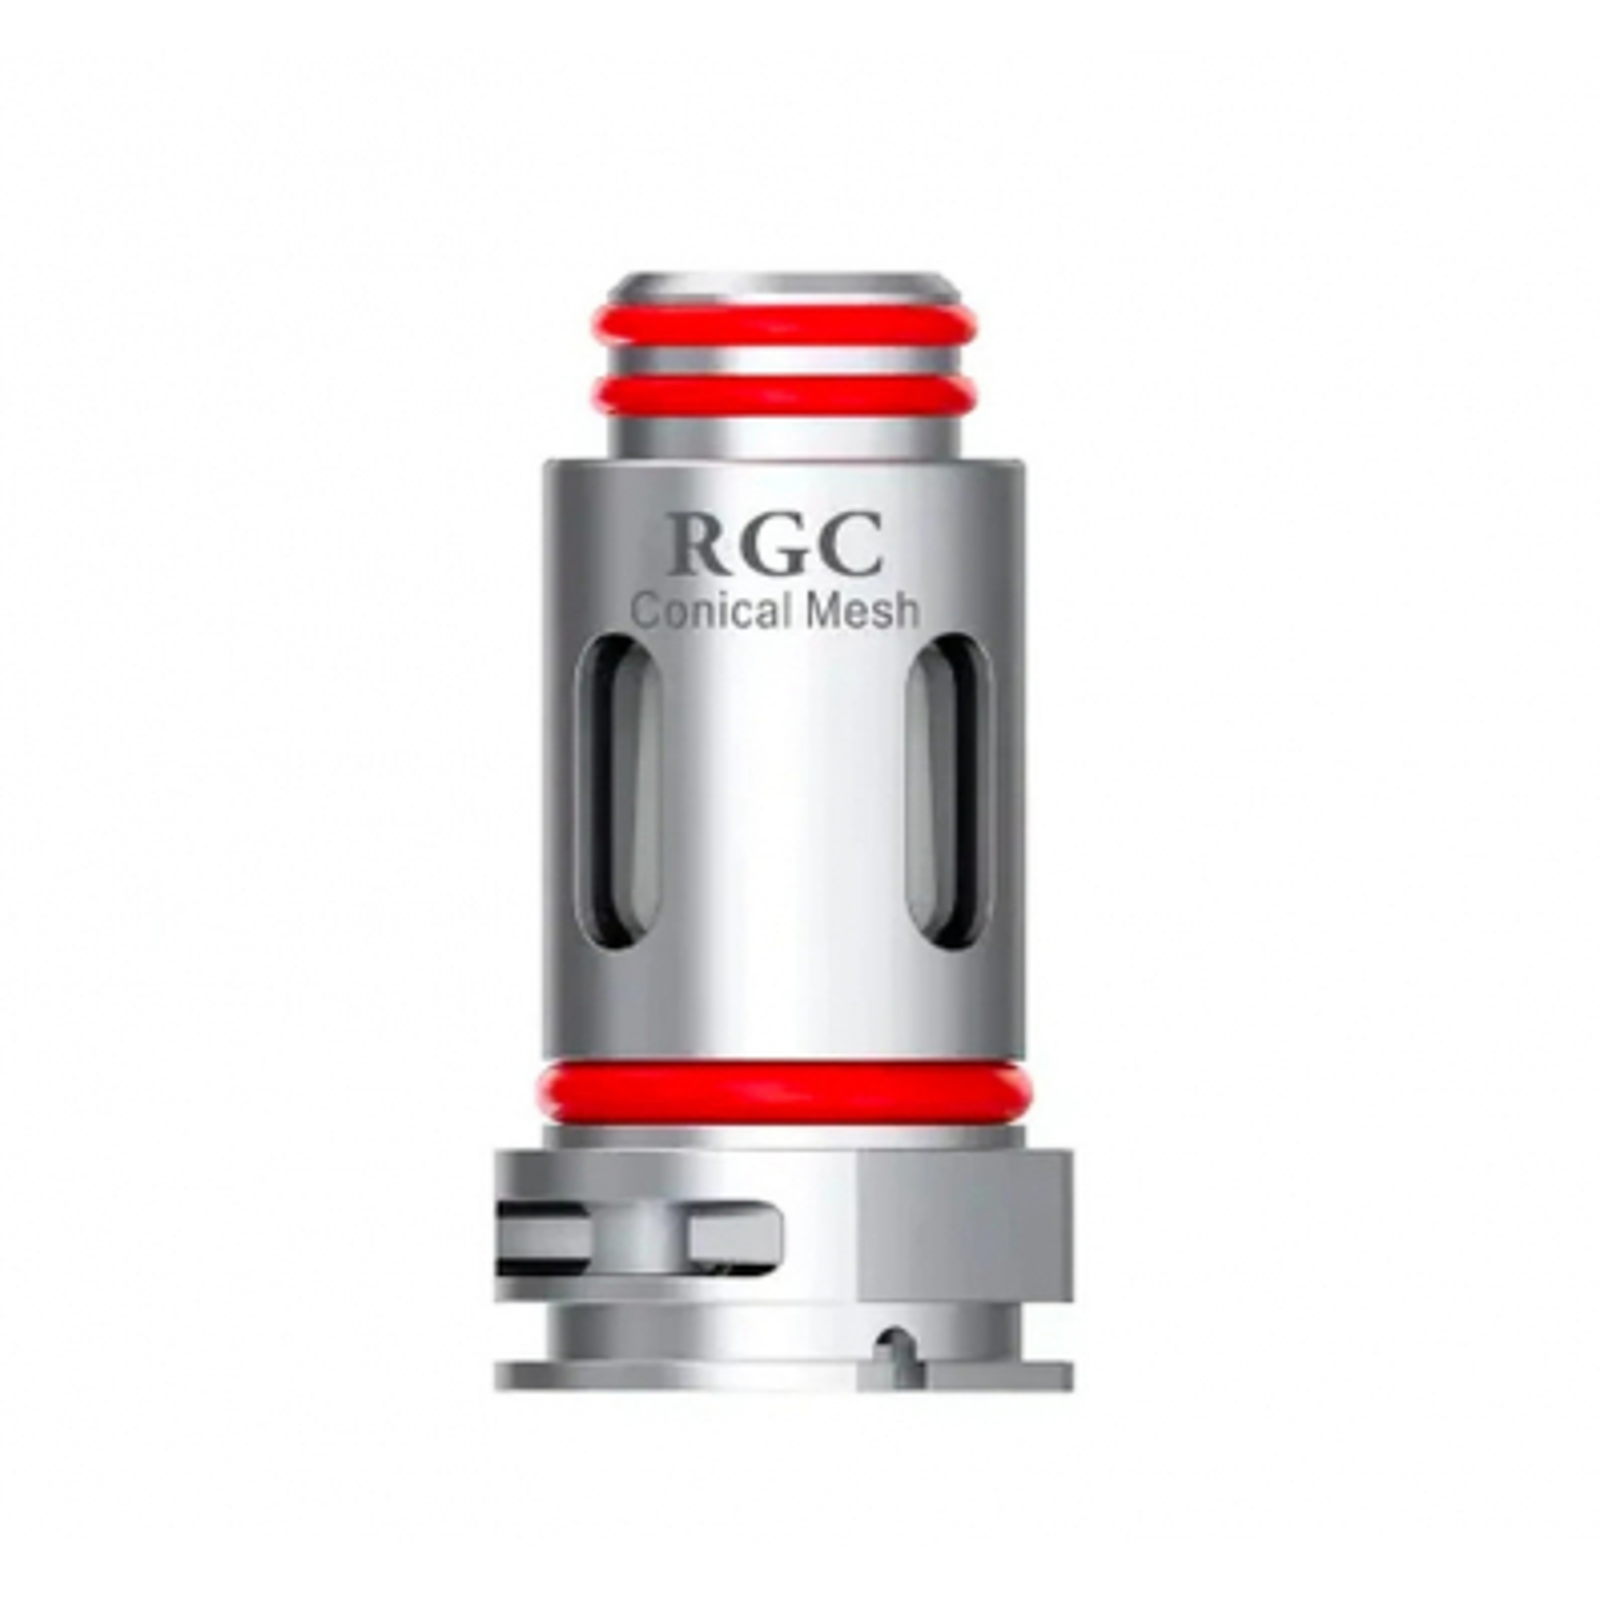 Résistance RPM 80 RGC Conical Mesh - SMOK